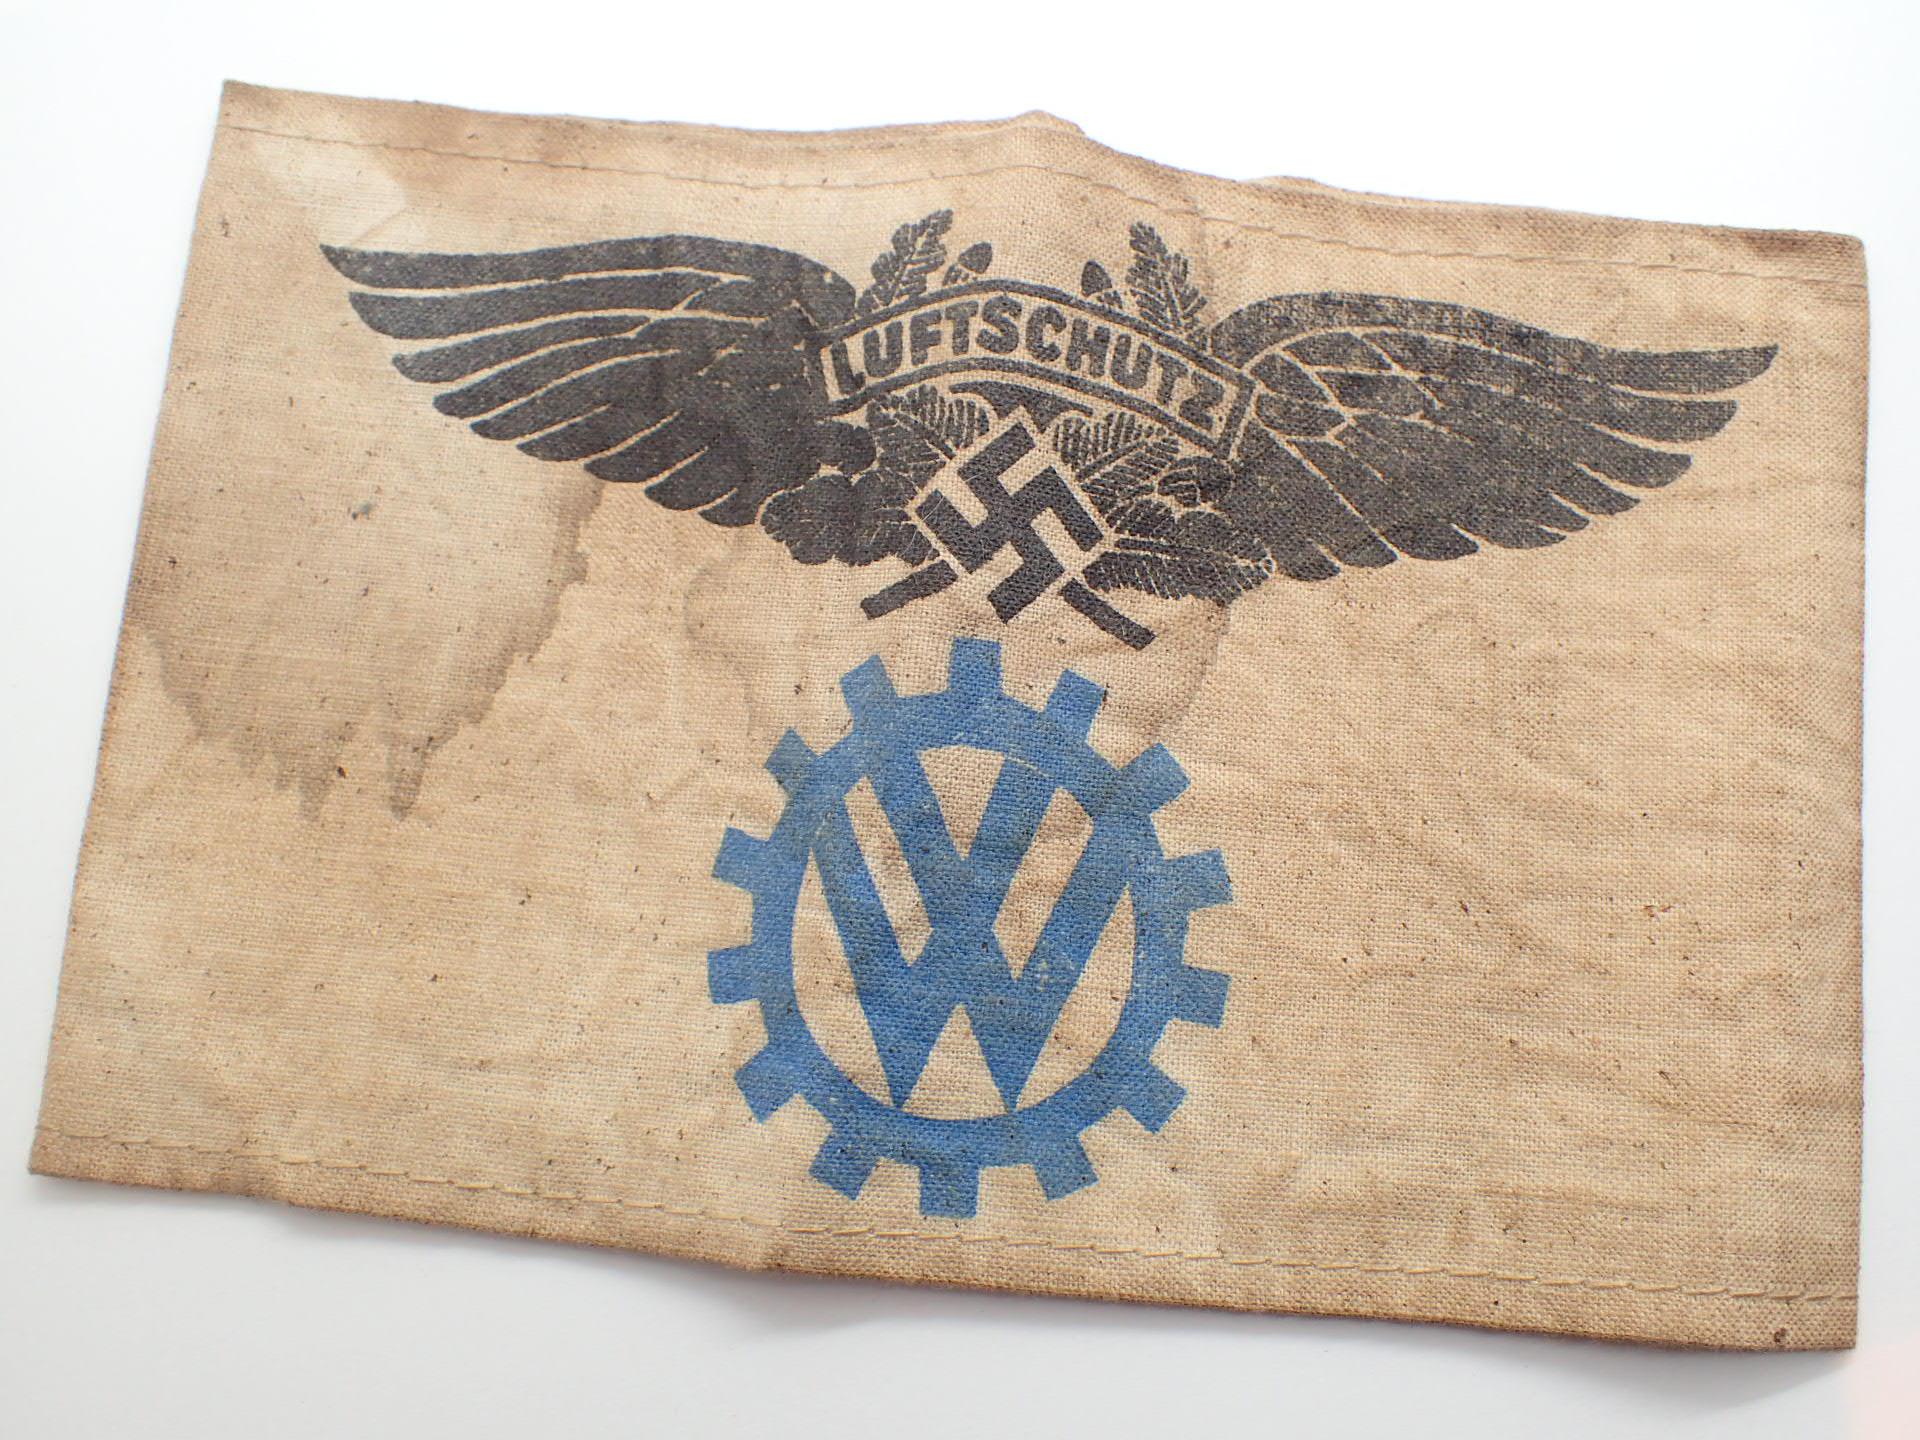 Lot 97 - WII German VW Luftschutz armband